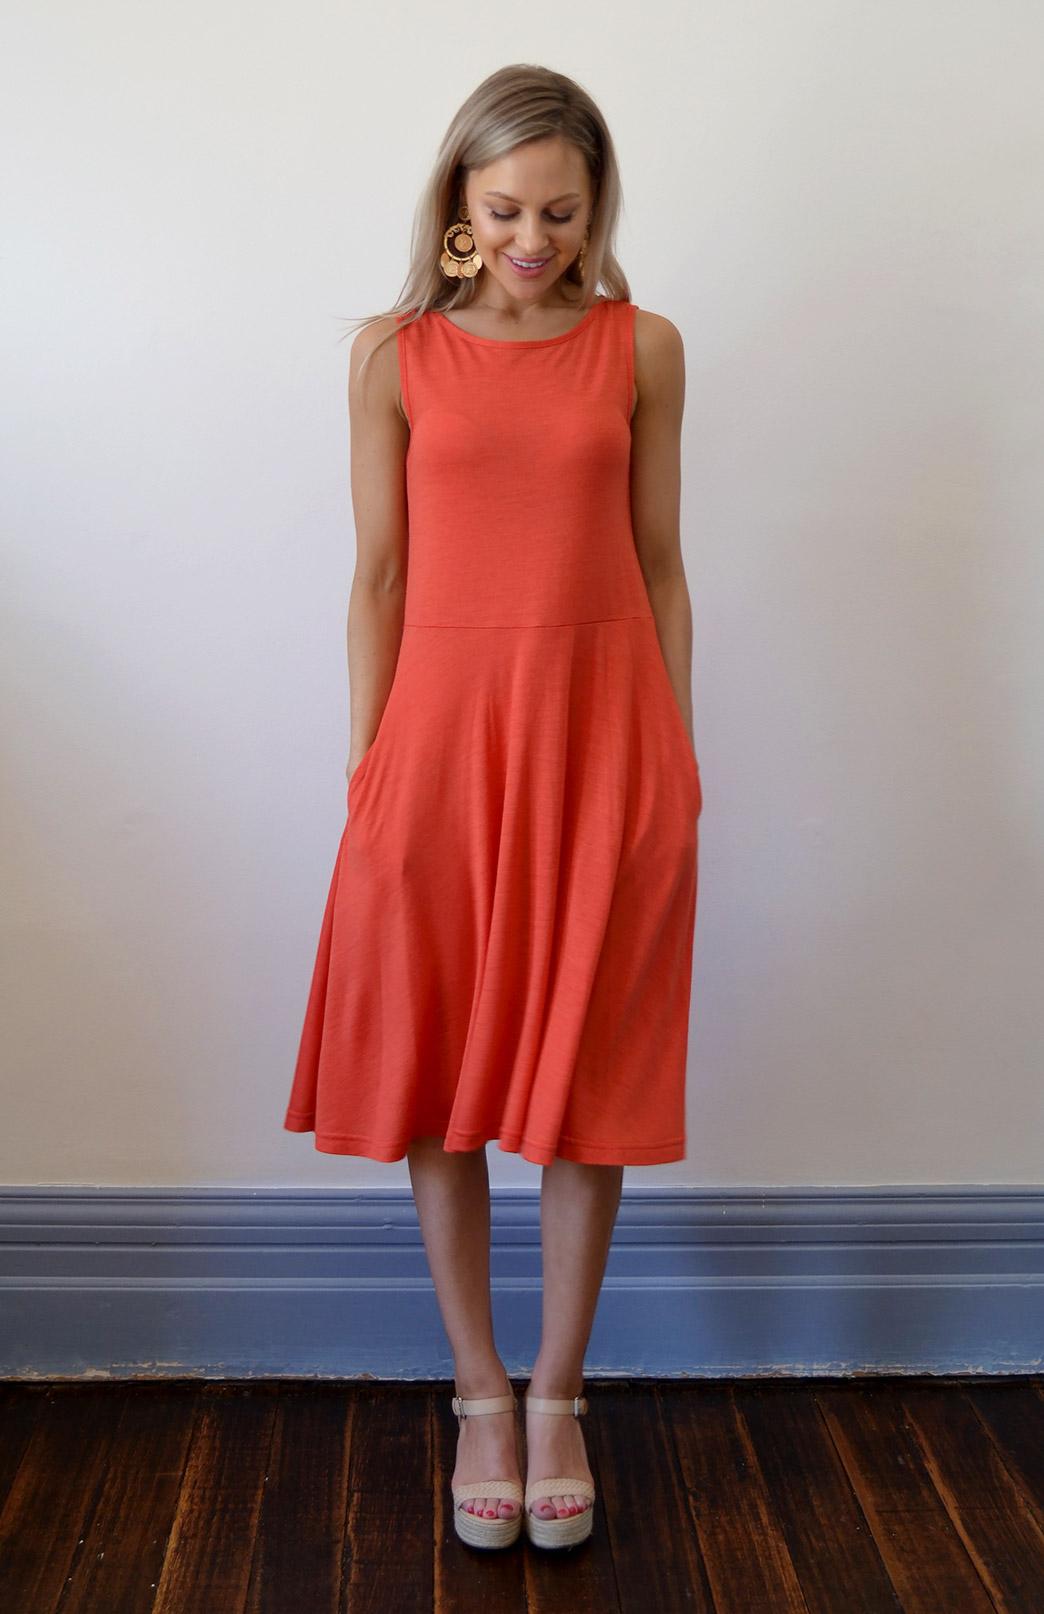 MaryAnn Fit and Flare Dress (SECONDS) - Women's Merino Wool Sleeveless Mary Dress with Pockets - Smitten Merino Tasmania Australia